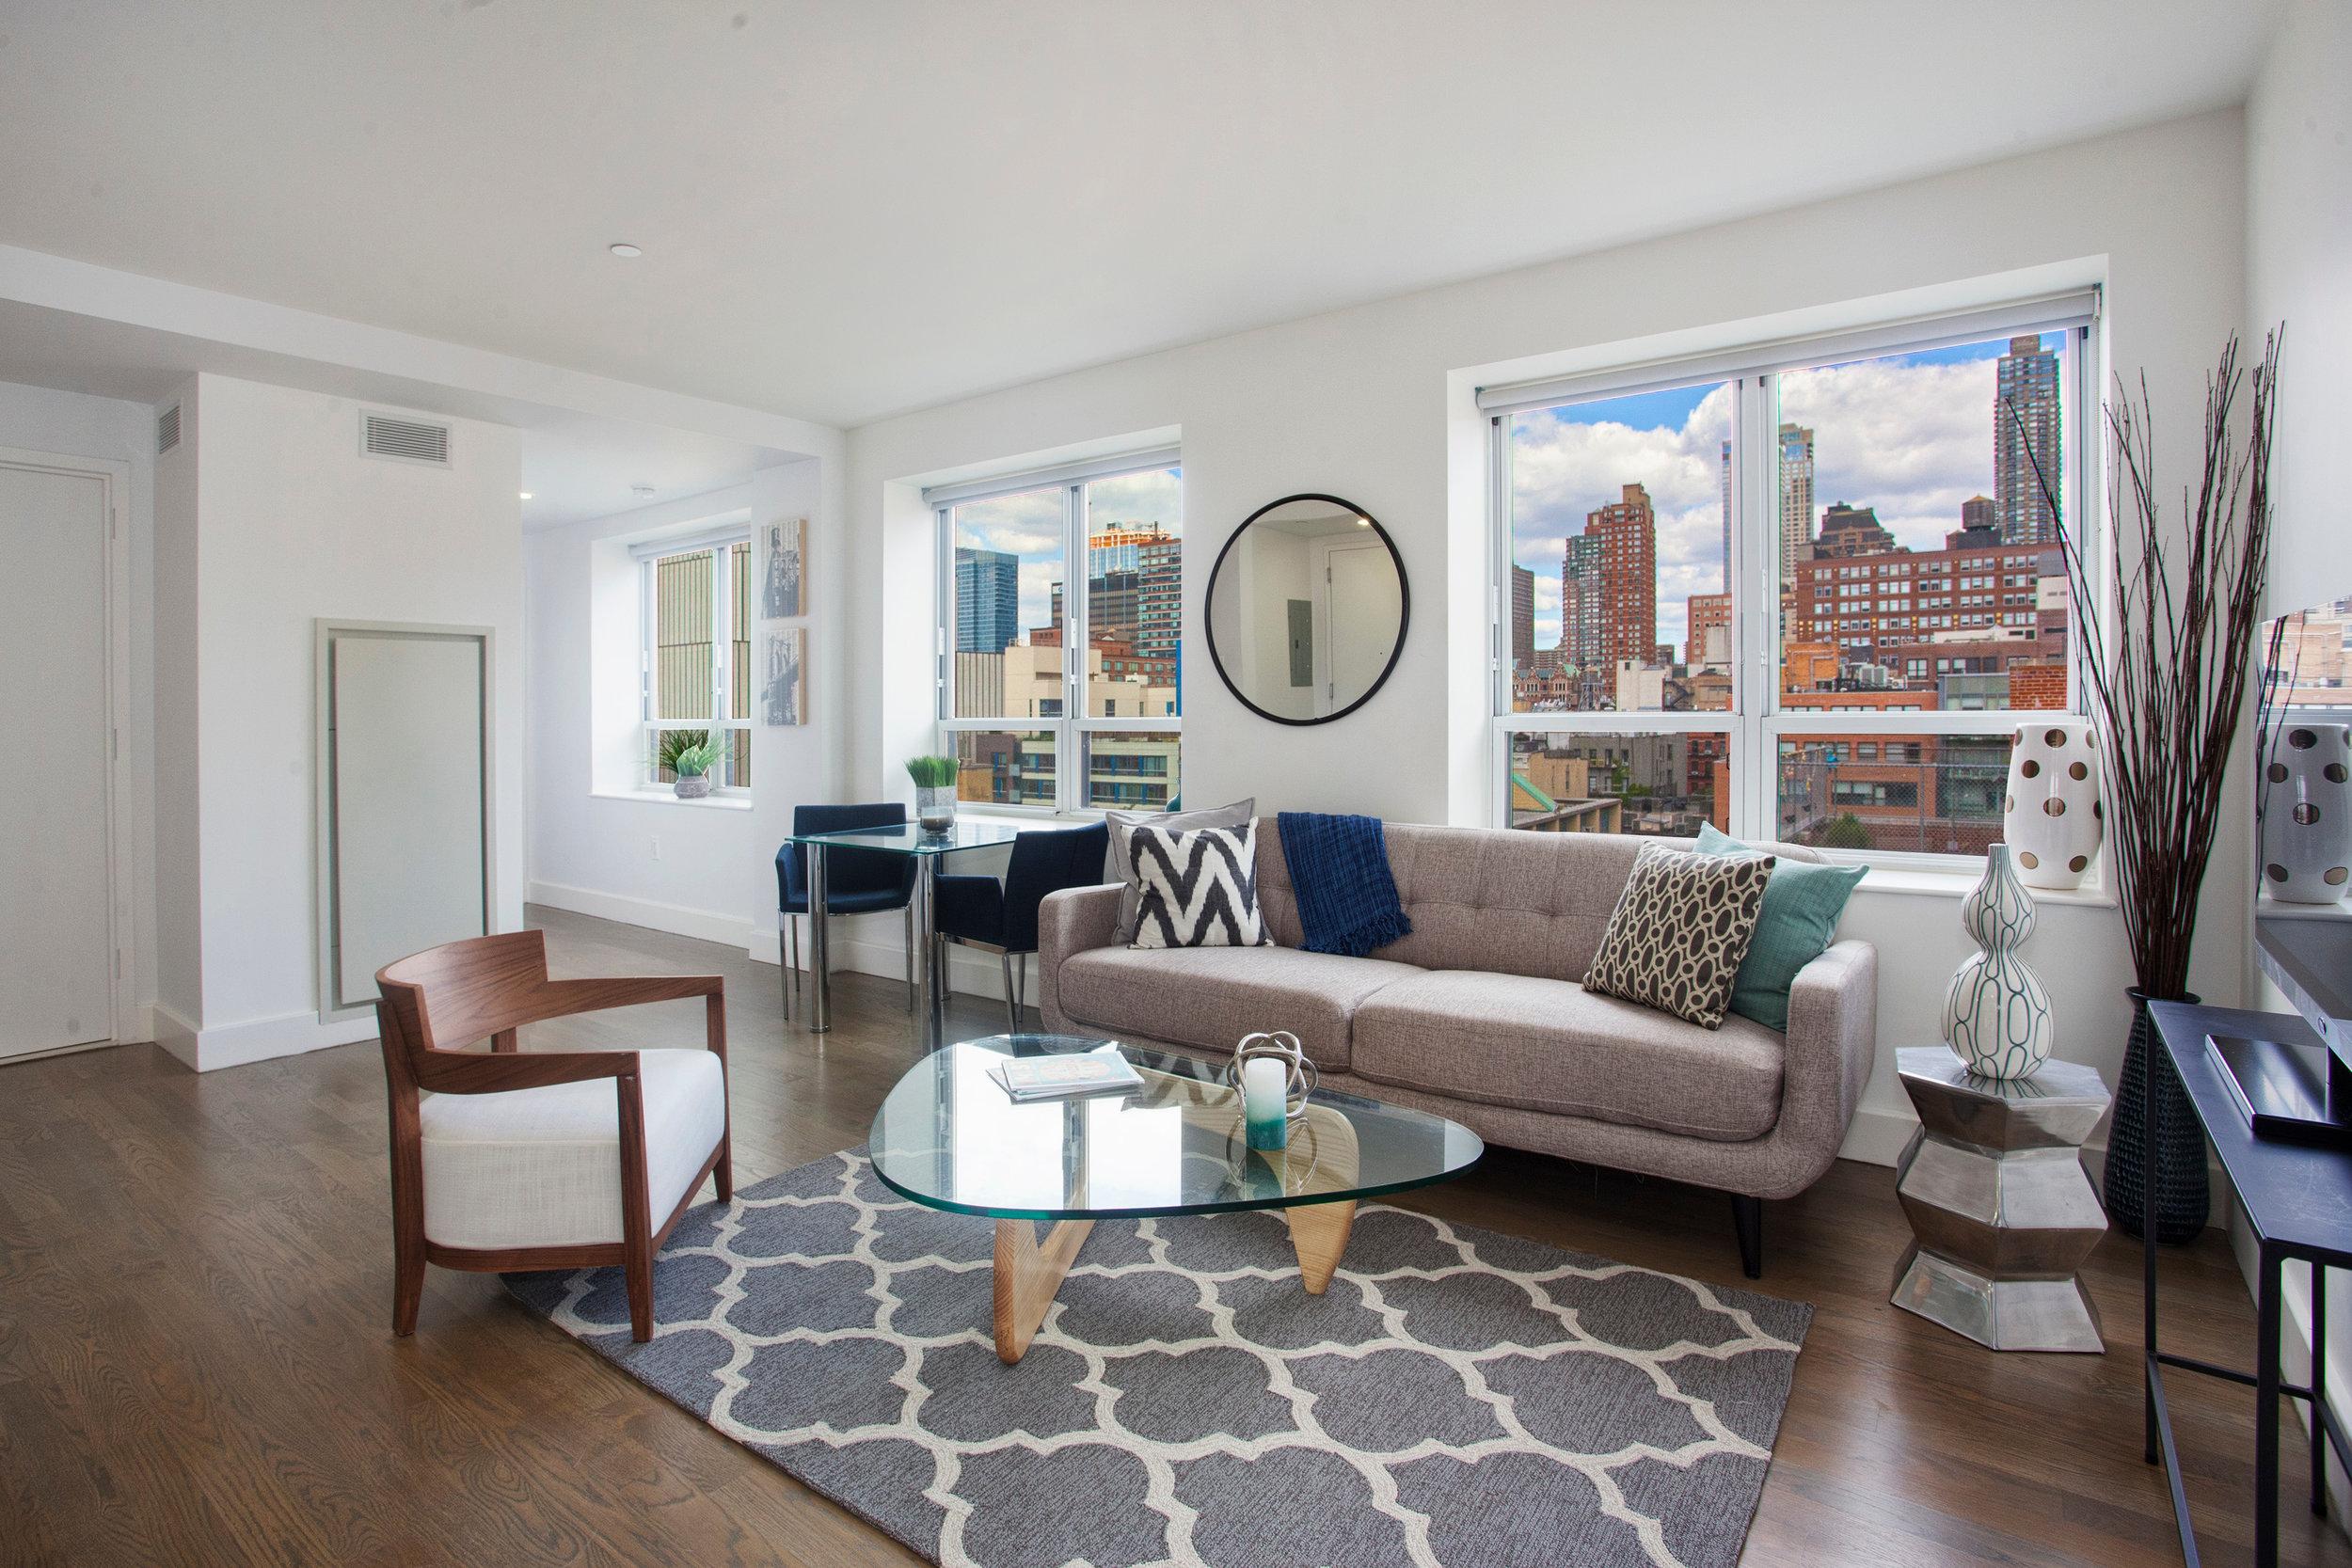 432 West 52nd Street #PH7H - $1,150,000